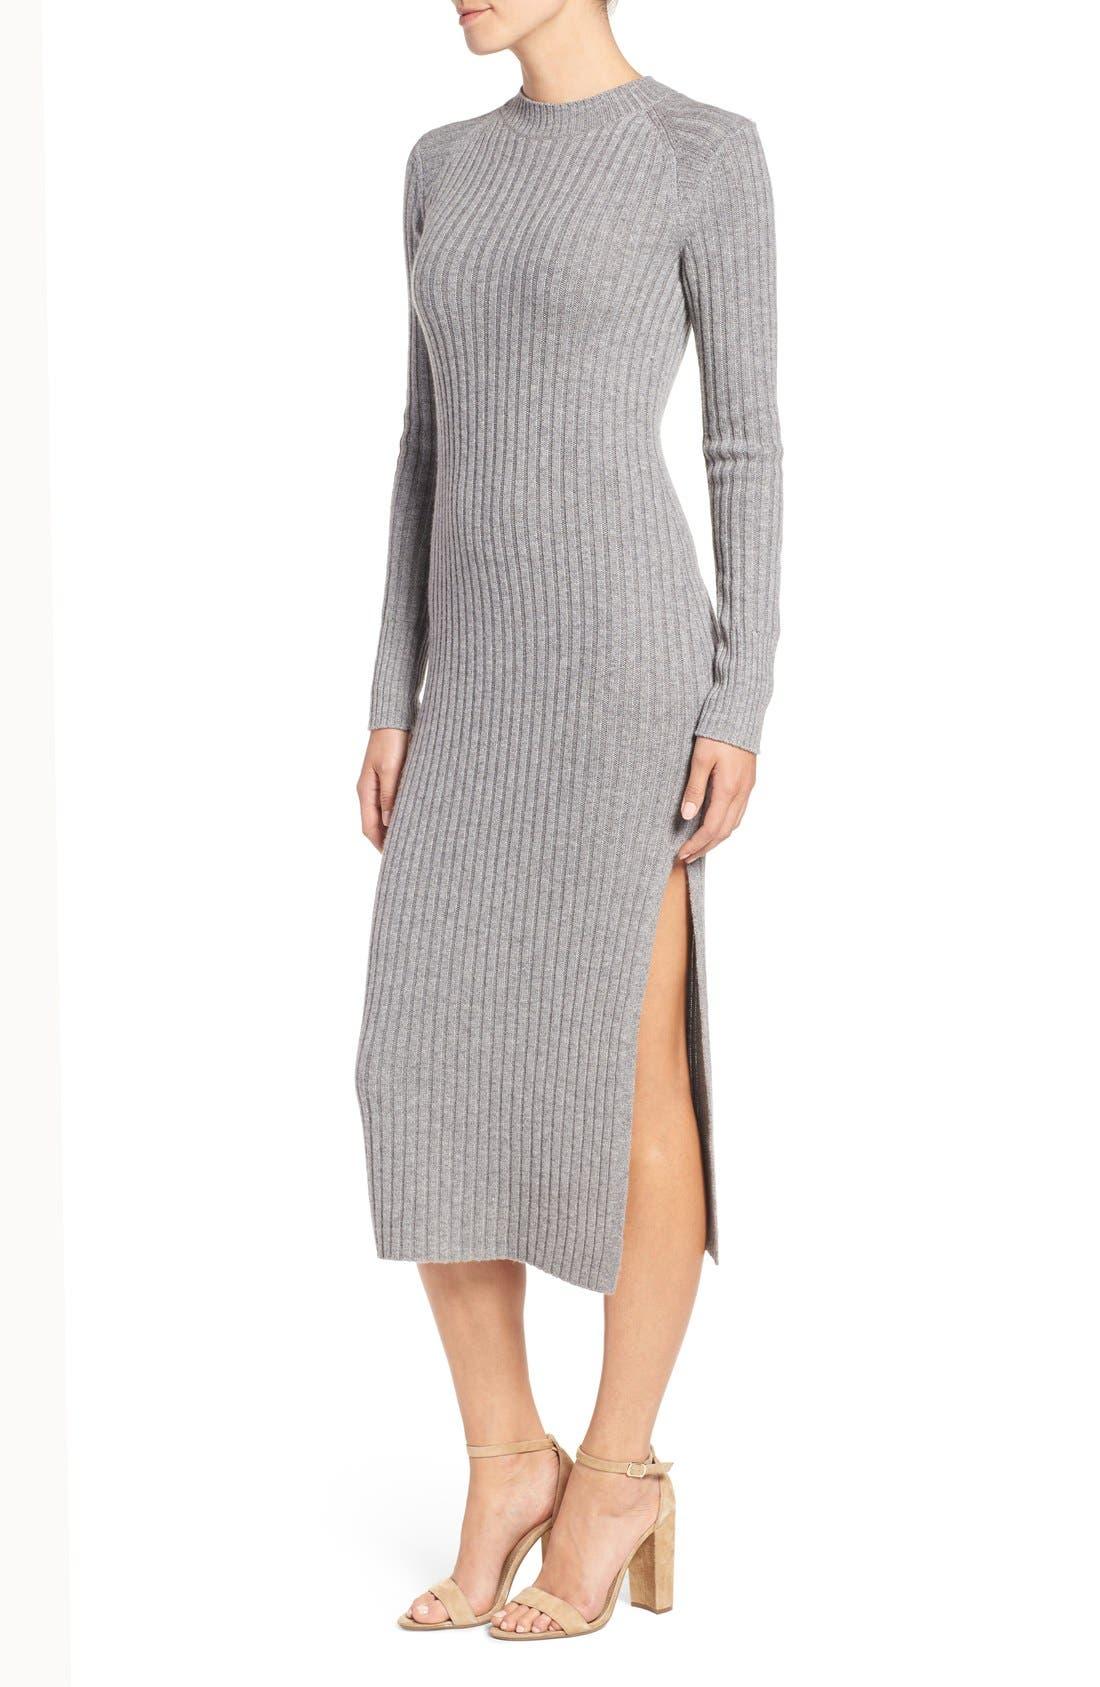 Reign Merino Wool & Cashmere Sweater Midi Dress,                             Alternate thumbnail 3, color,                             Medium Heather Grey